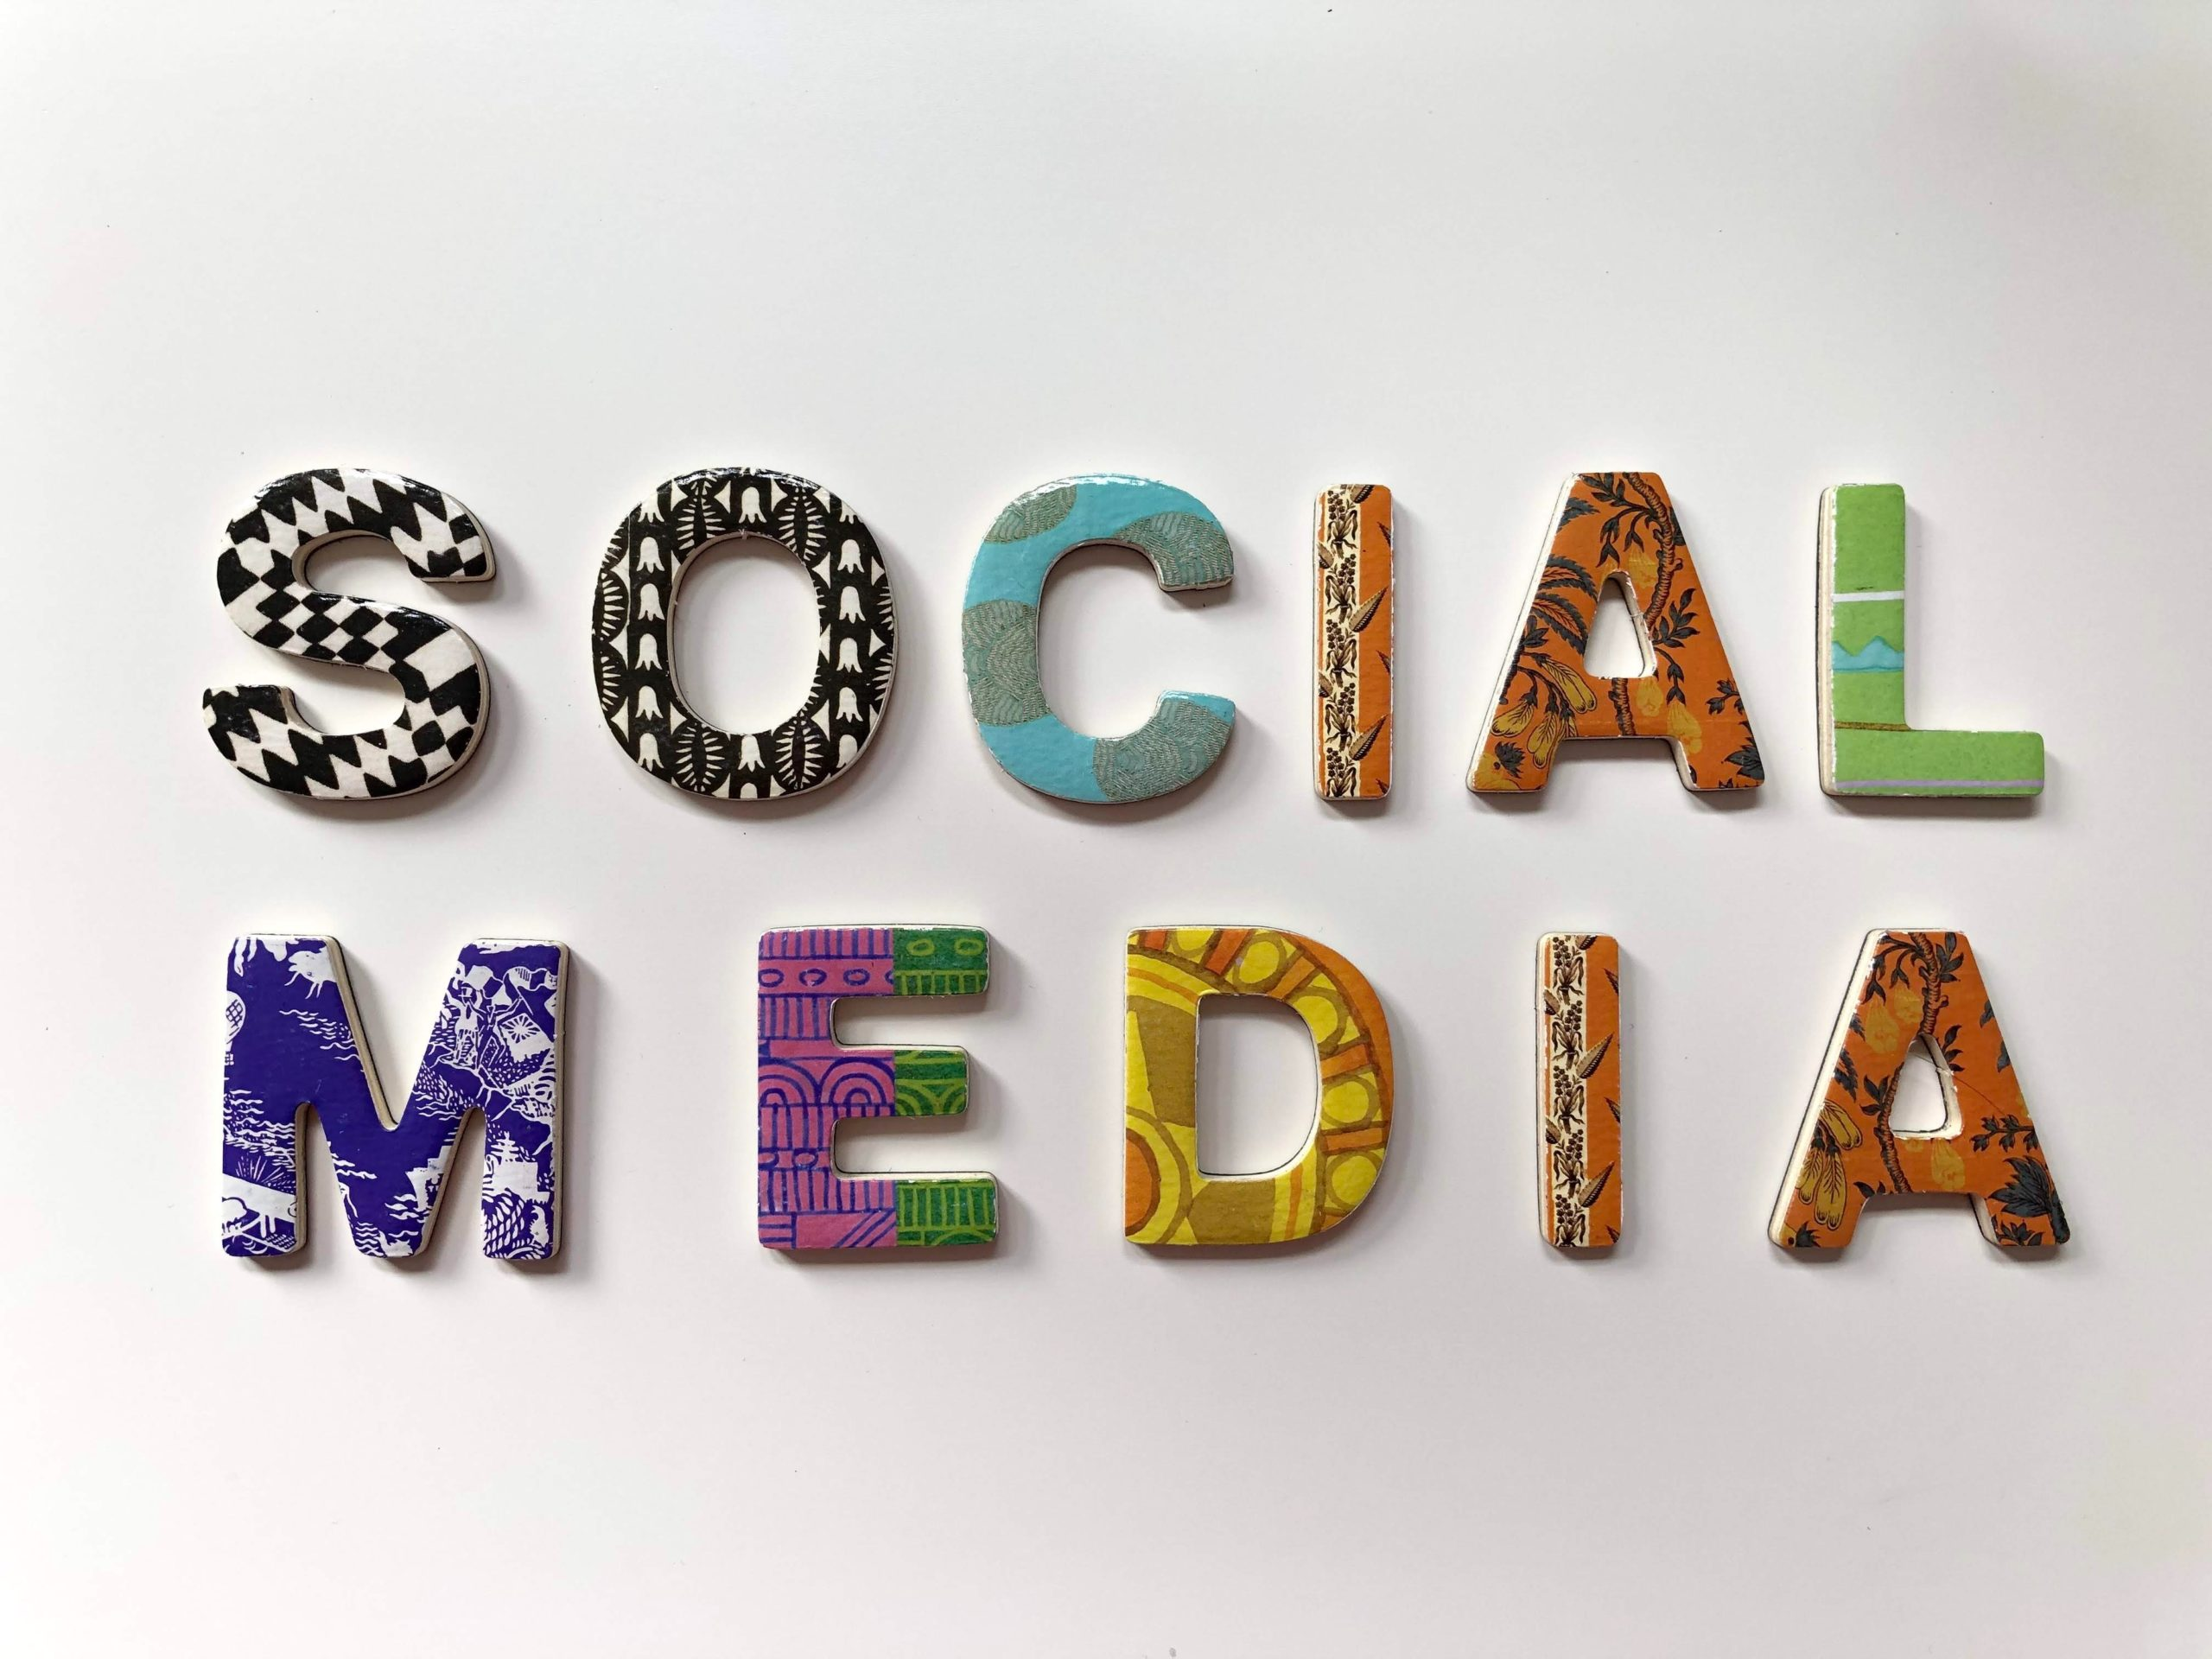 Social-Media-Marketing im B2B-Bereich: Zahlt es sich aus?